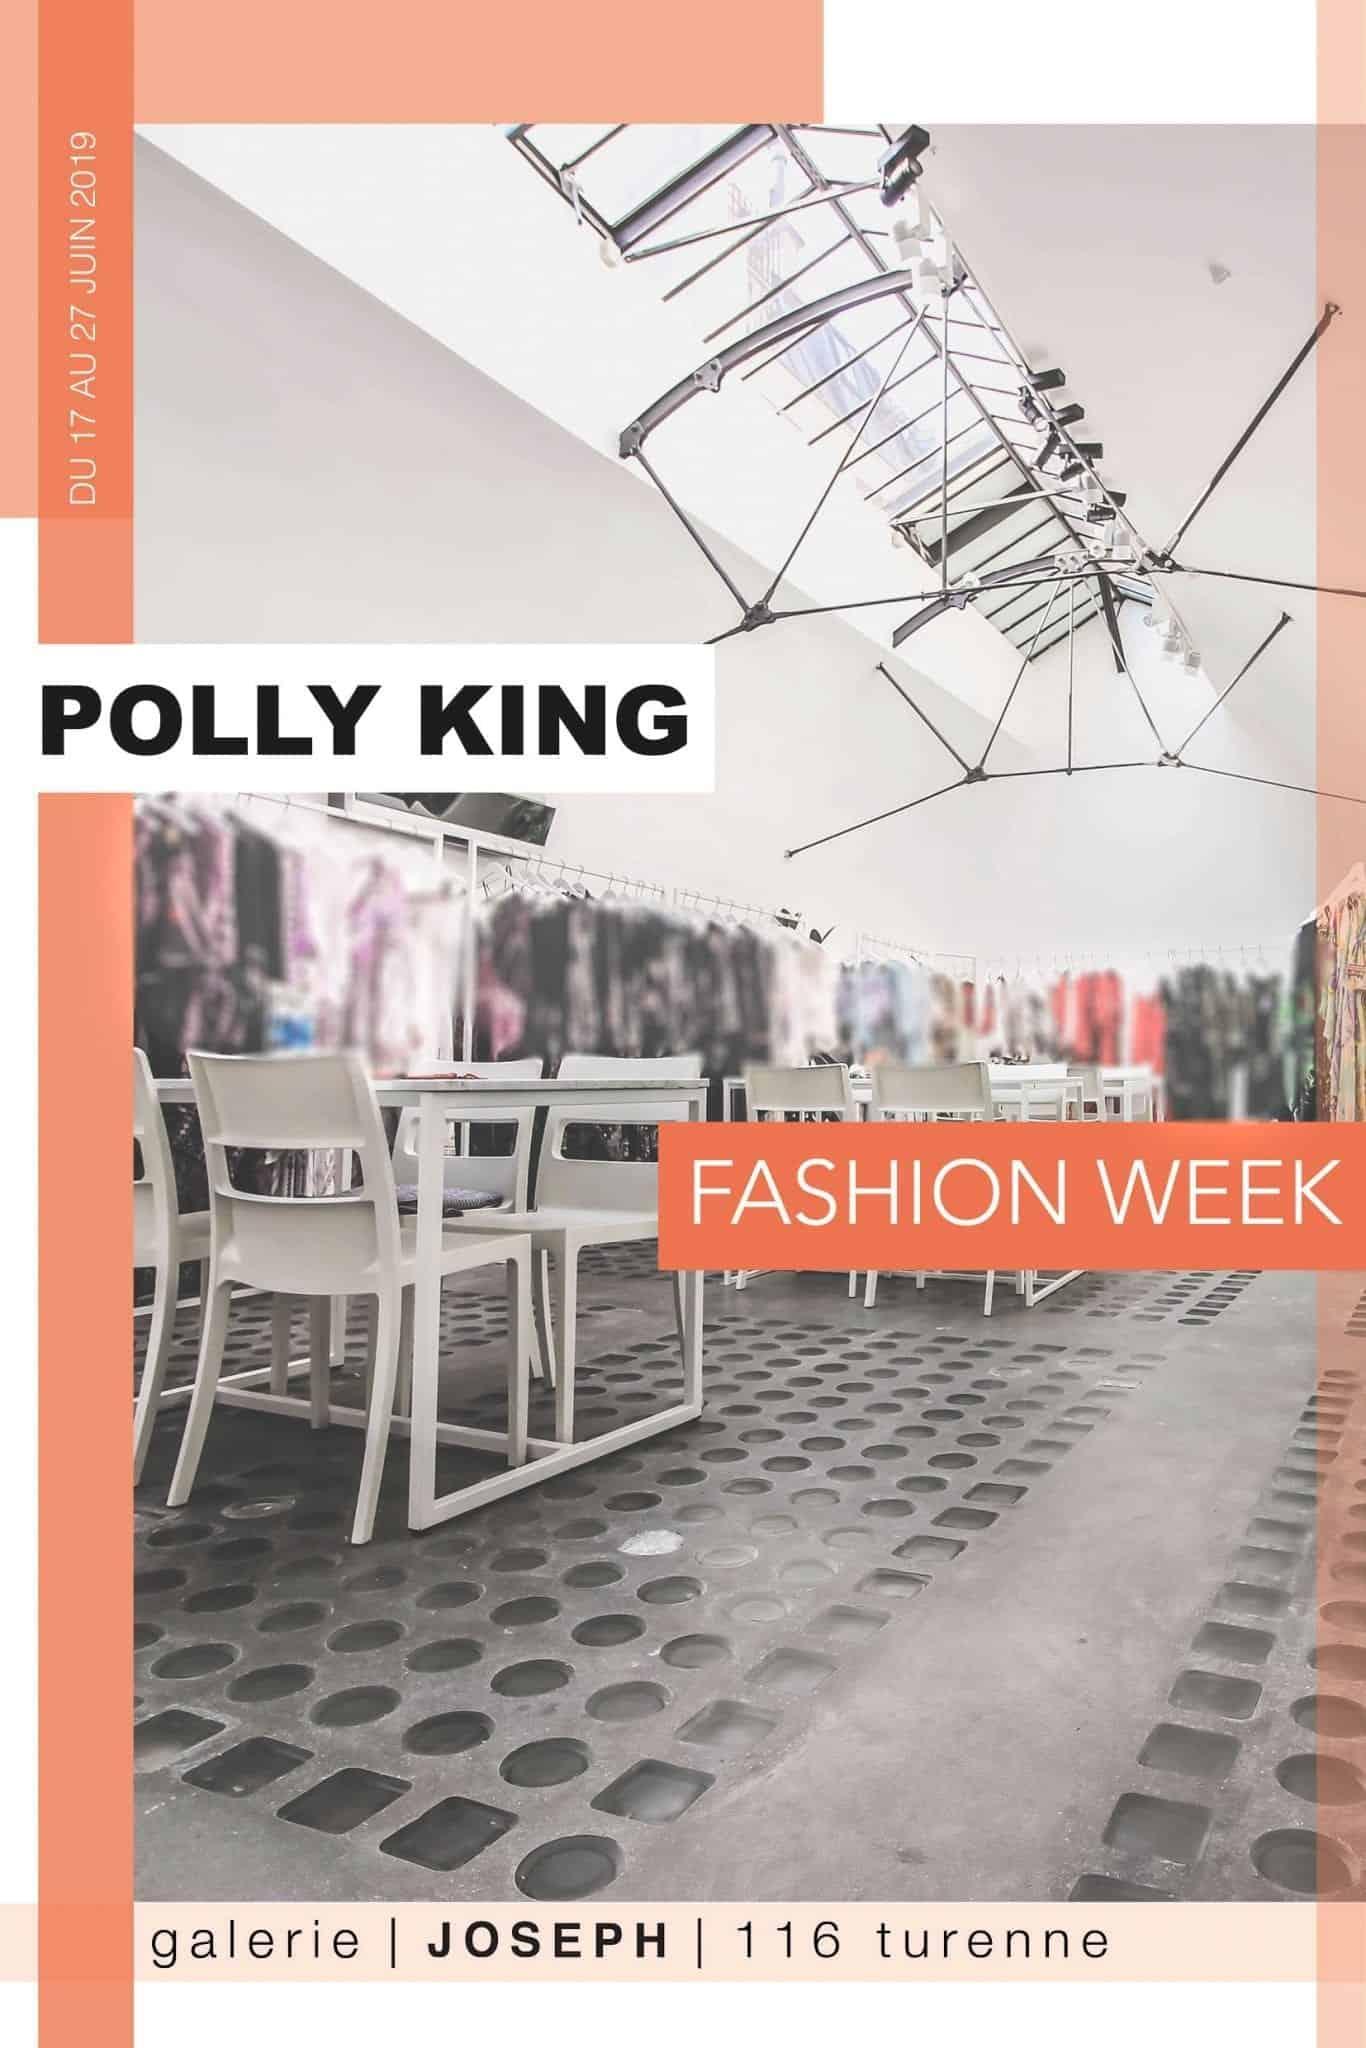 Polly King